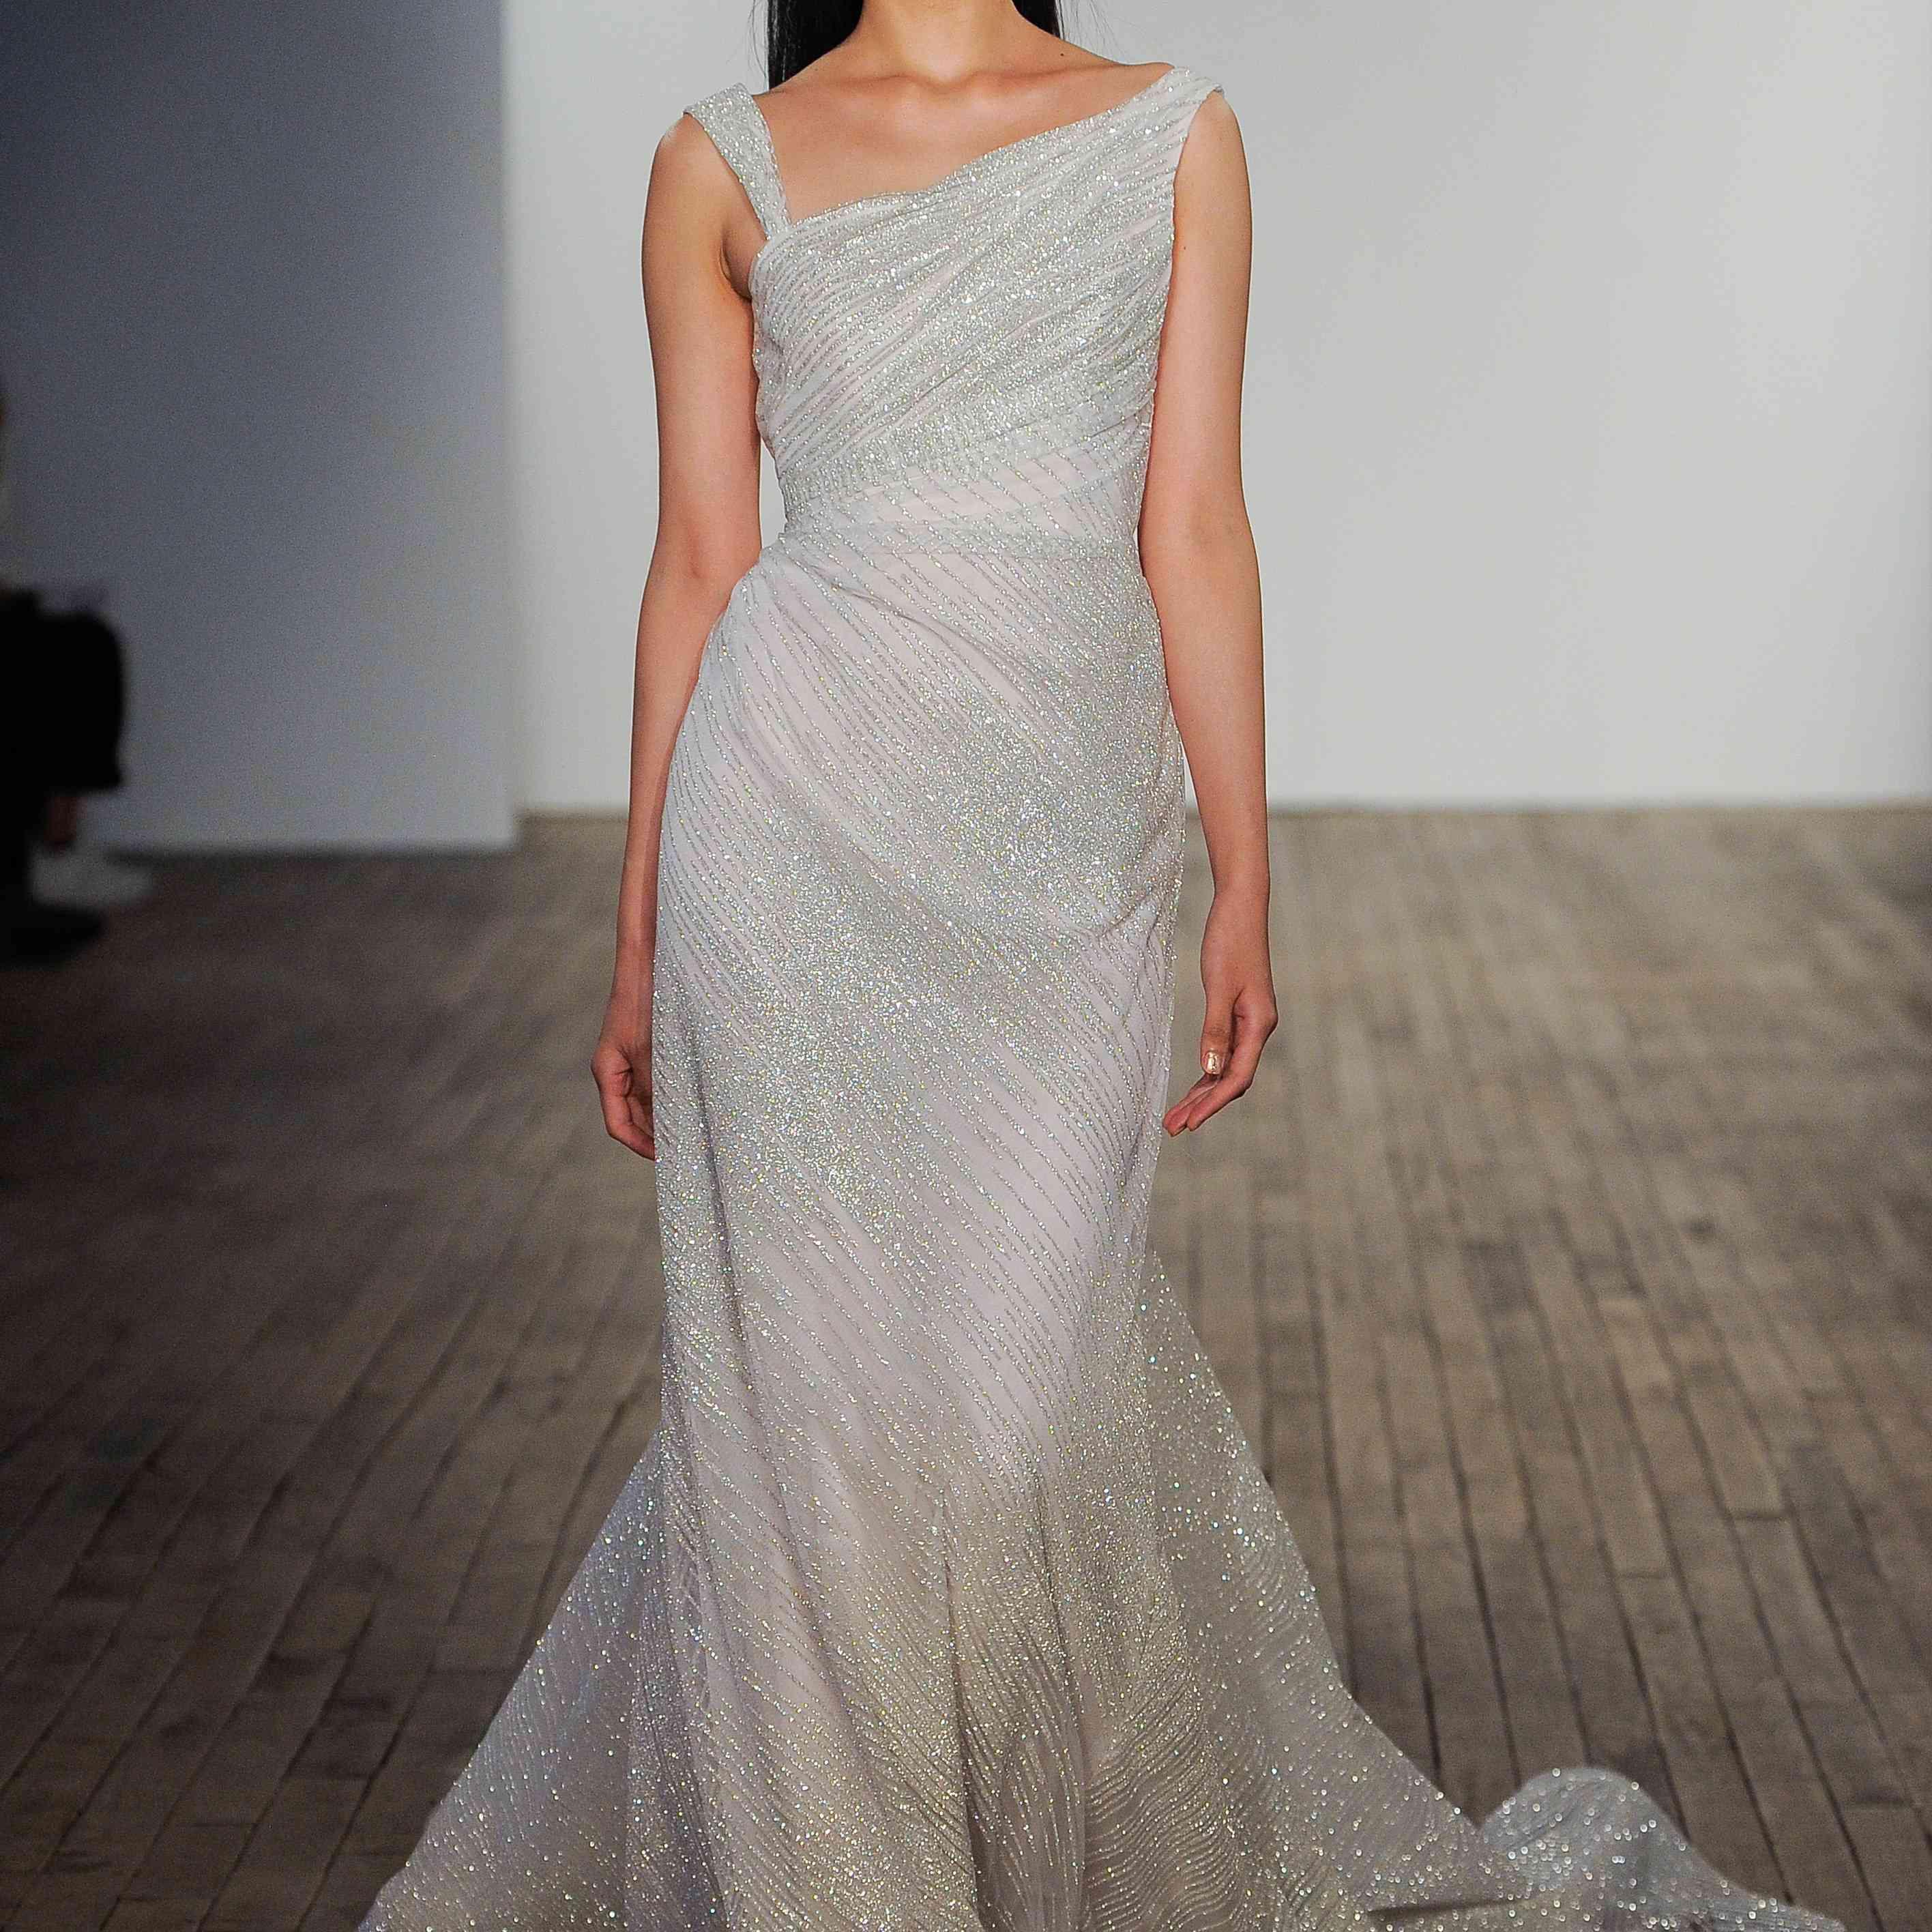 Meryl one-shoulder wedding dress